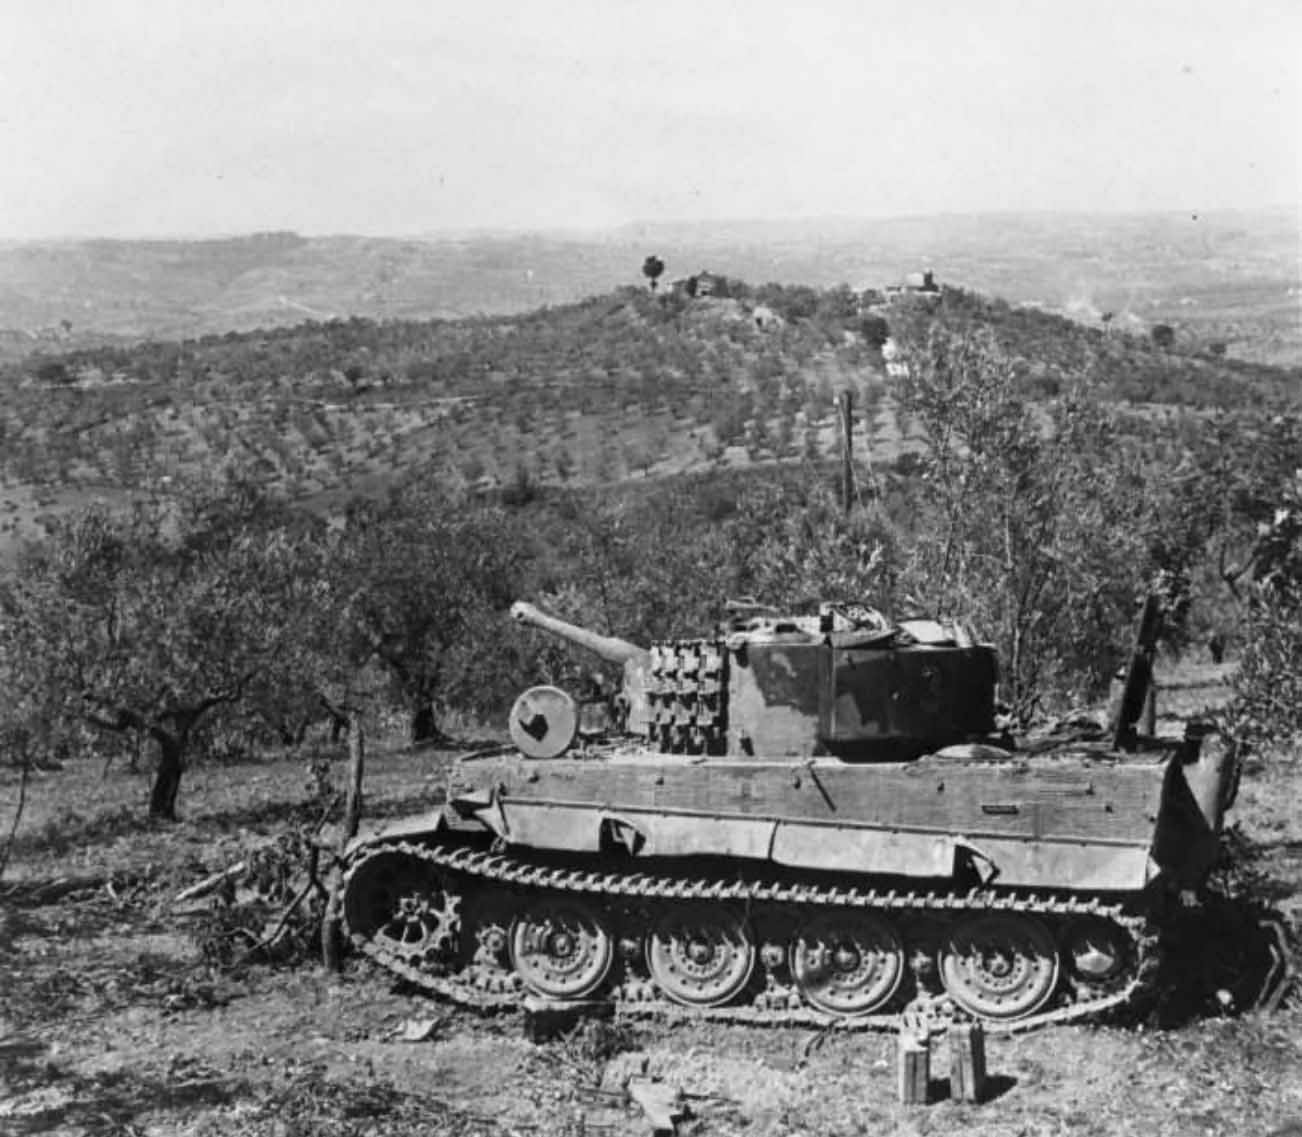 German Tiger tank late, steel wheels, number 3 of schwere Panzer-Abteilung 508, La Romola Italy